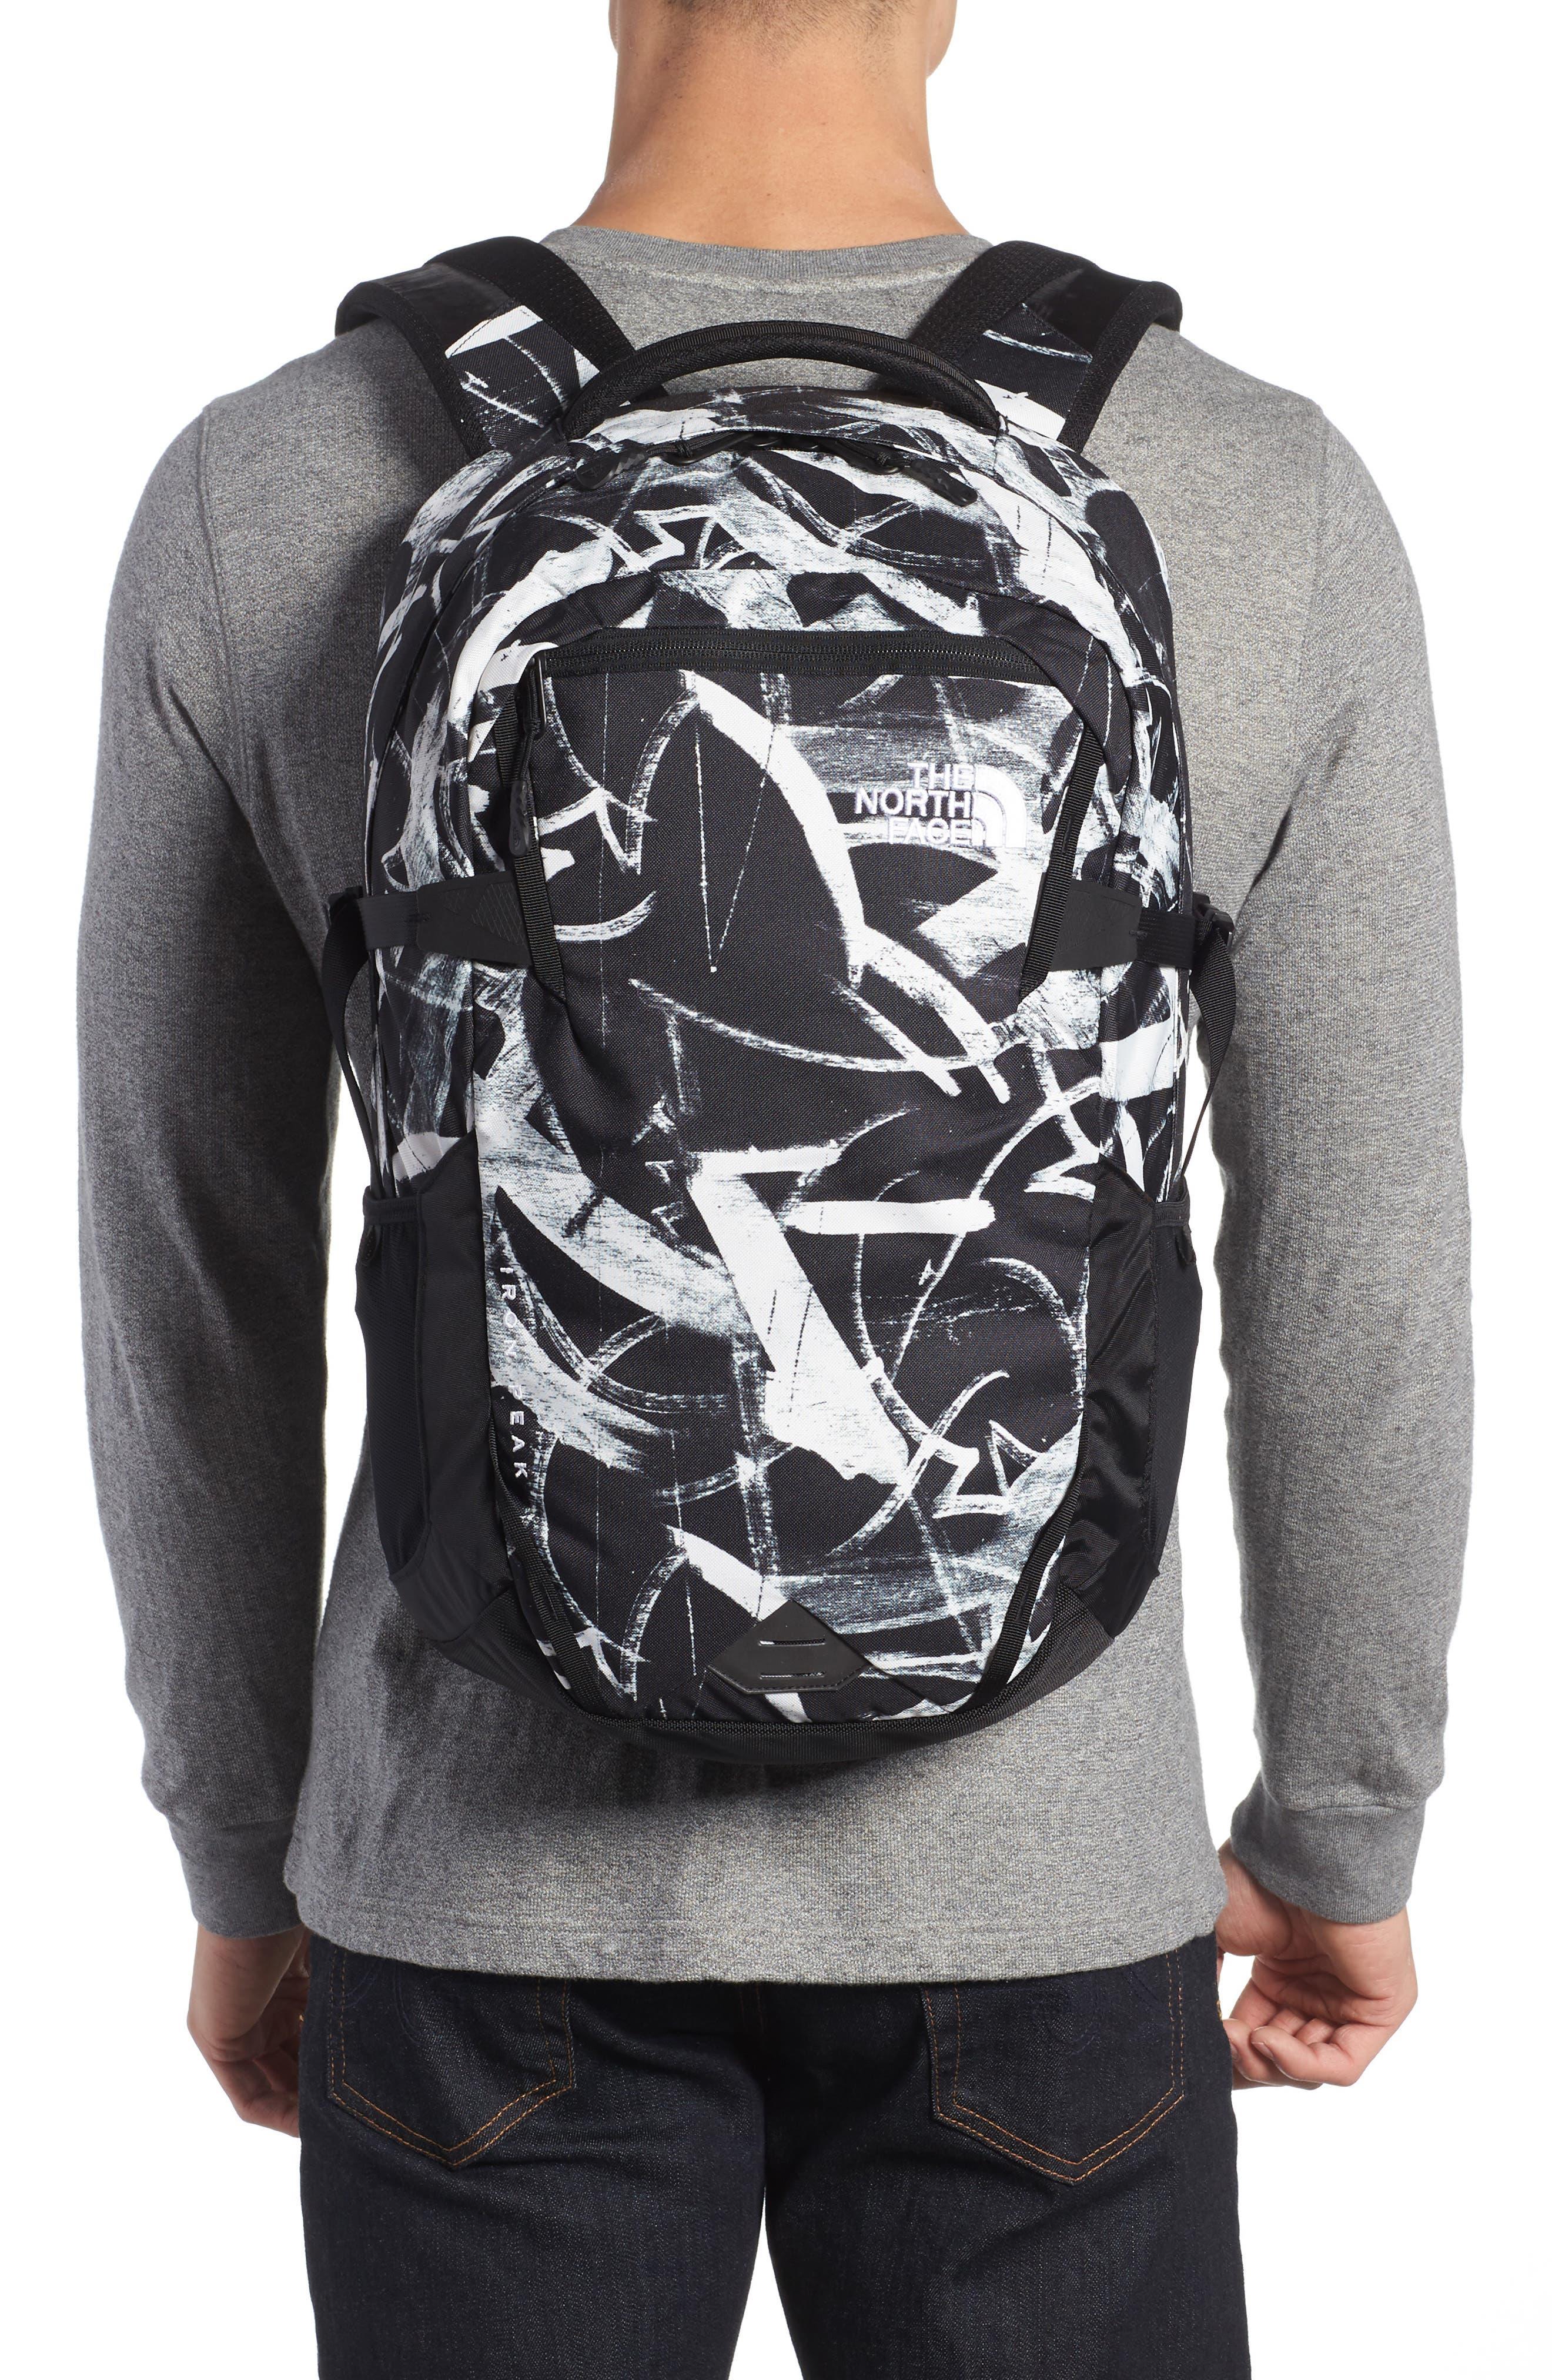 Iron Peak Backpack,                             Alternate thumbnail 5, color,